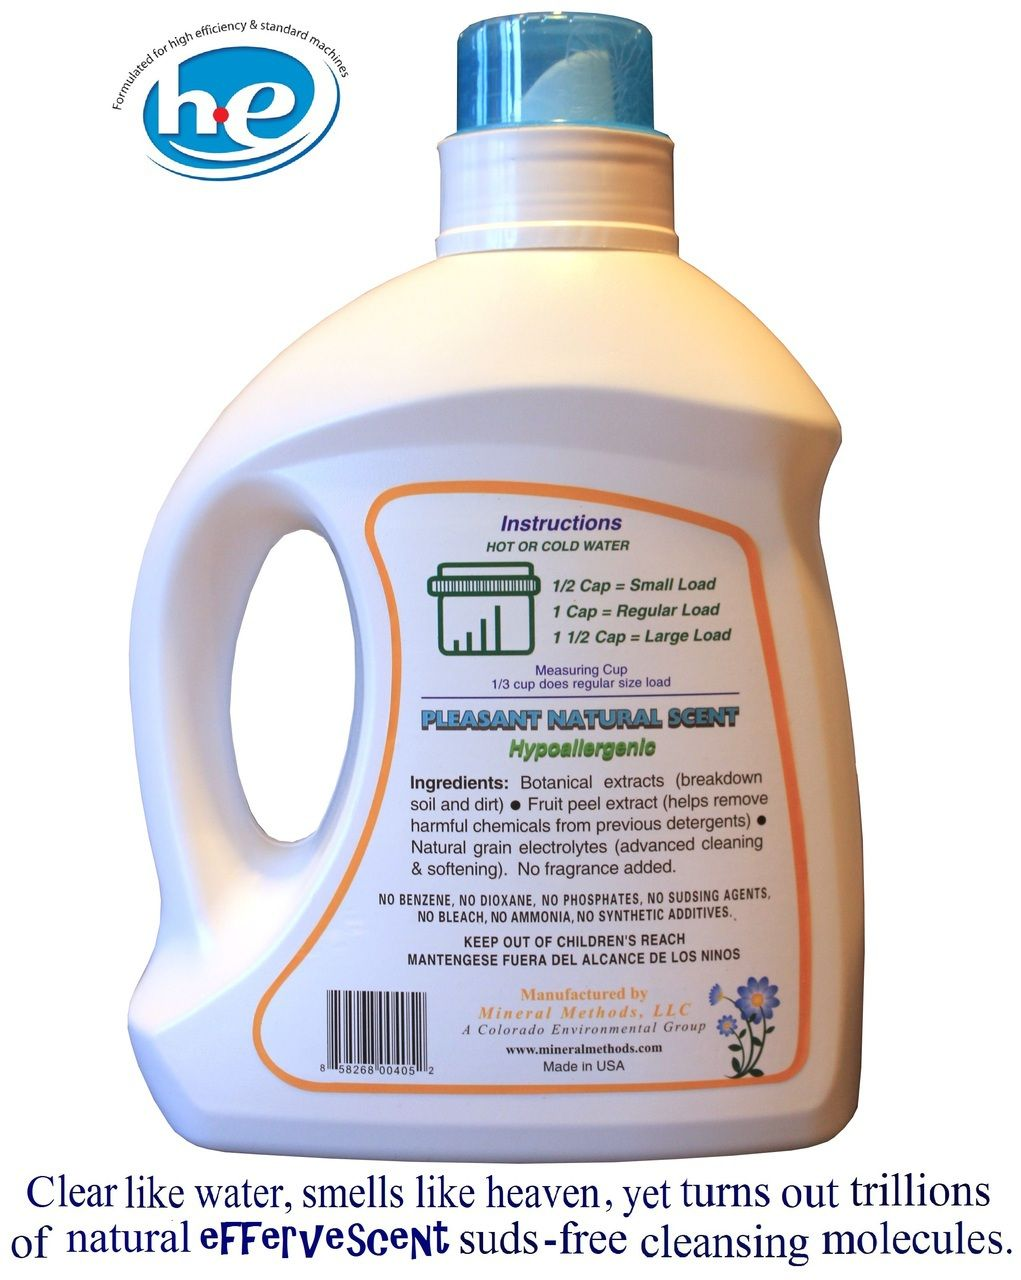 Http Www Itk1 Com Rain Laundry Detergent Organic Natural Skin Care Skin Care Eczema Skin Care